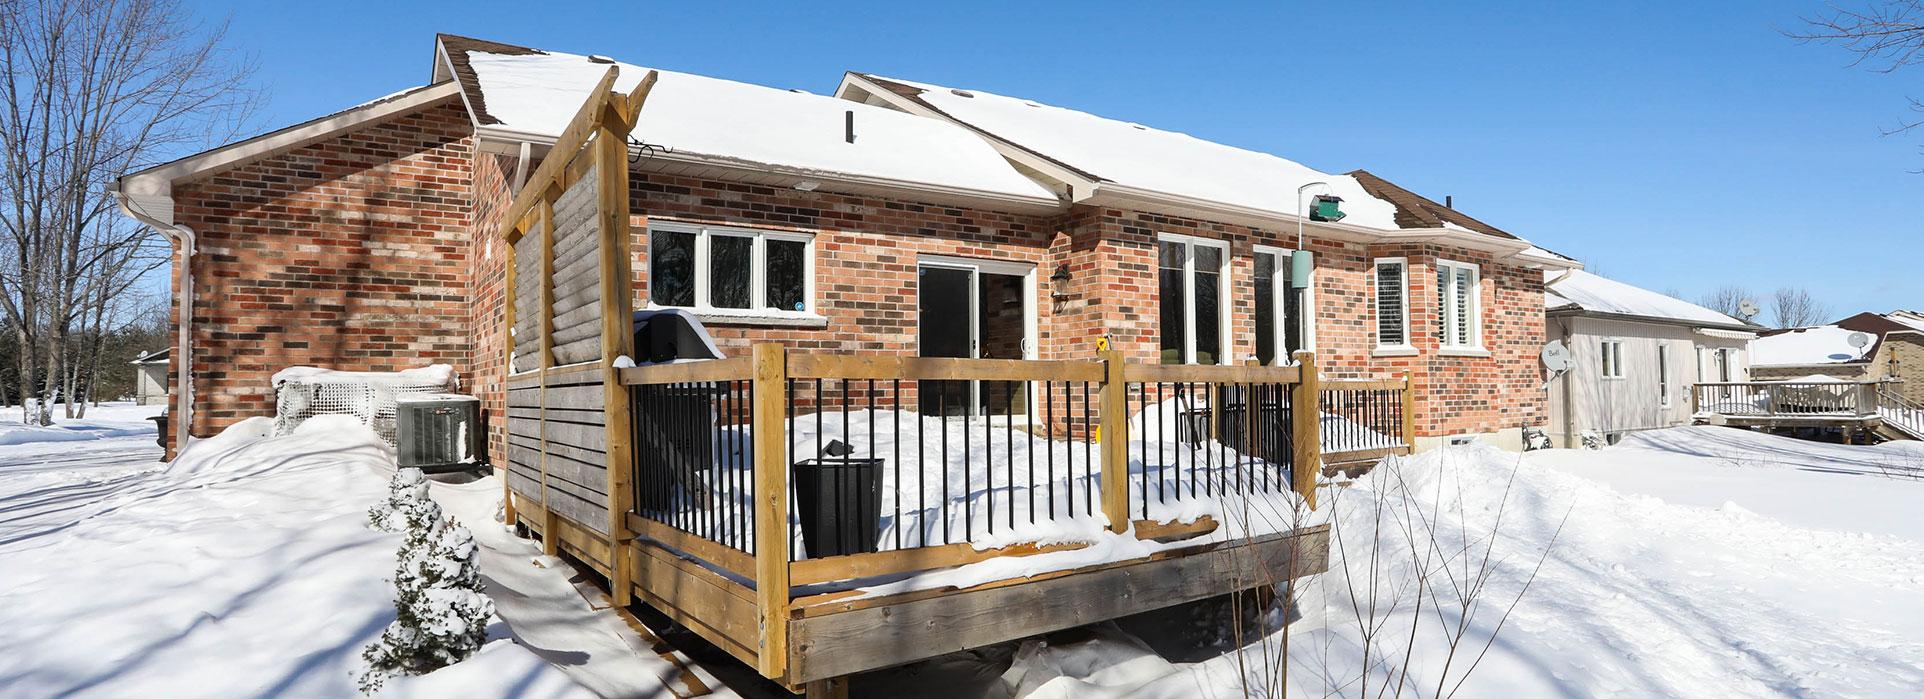 29 Merrington Avenue - Porch - Cripps Realty